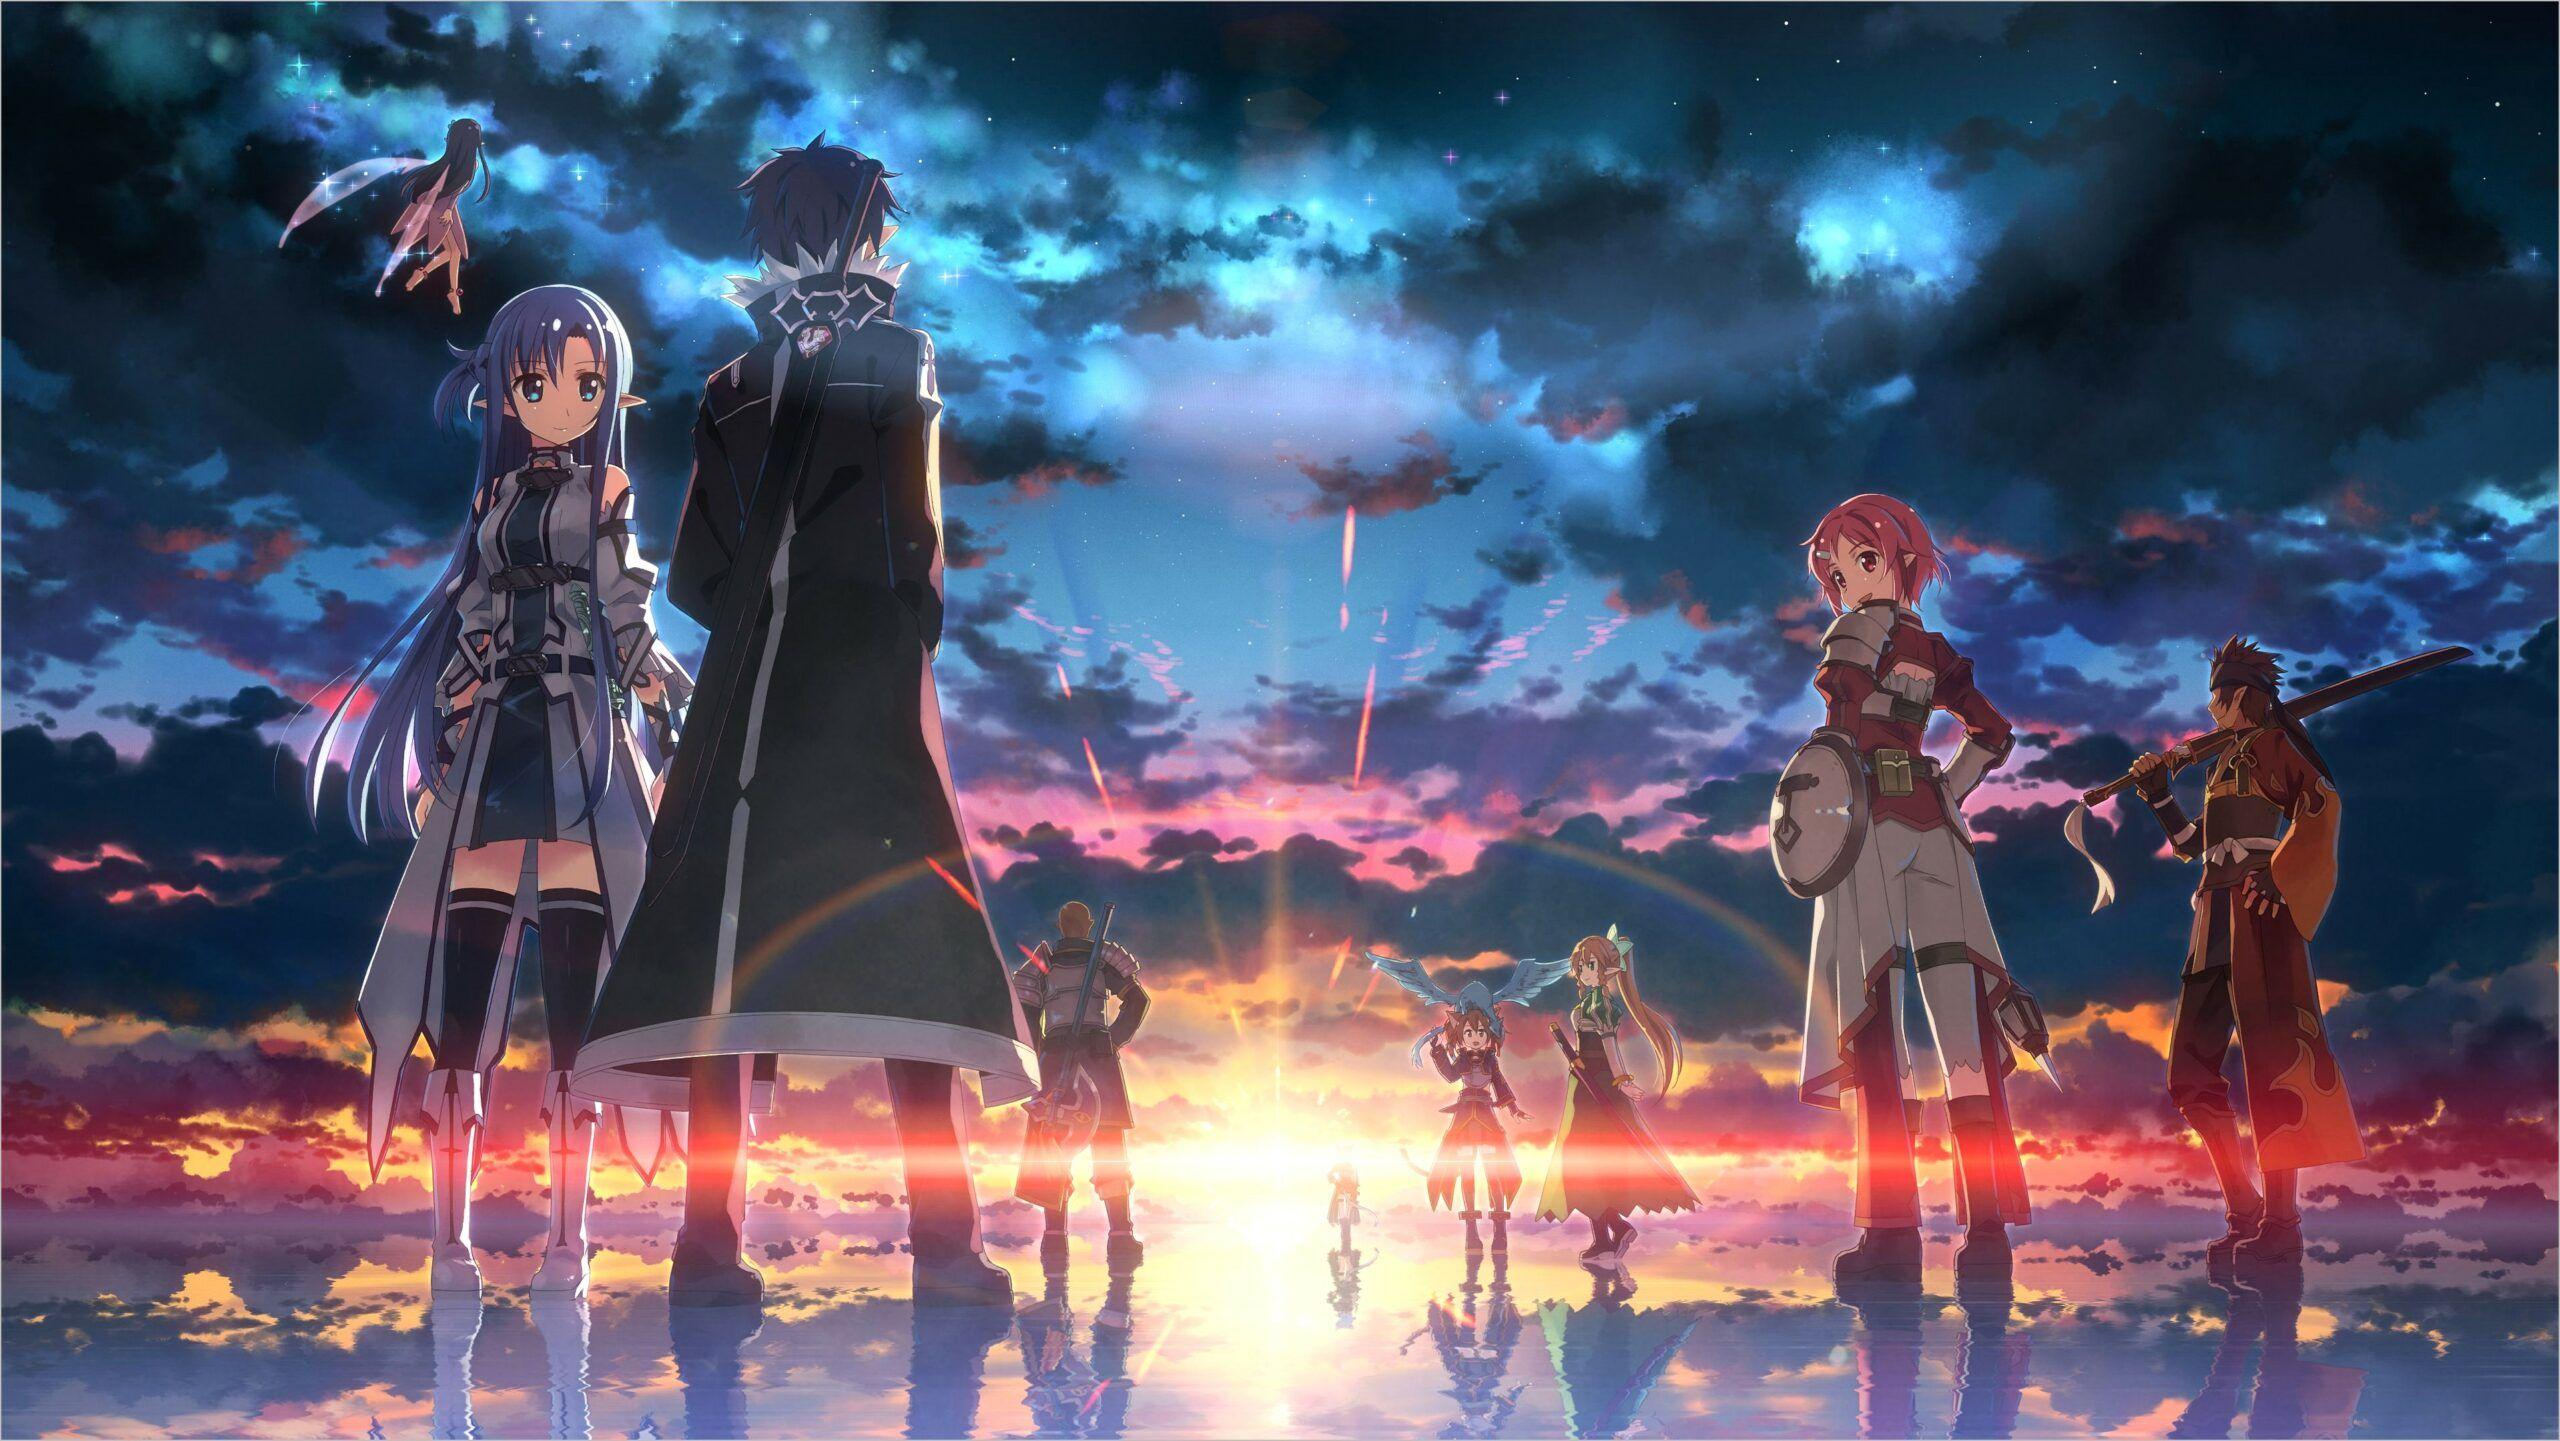 Wallpaper 4k Of Kawaii Anime Pc In 2020 Sword Art Online Wallpaper Sword Art Sword Art Online Poster